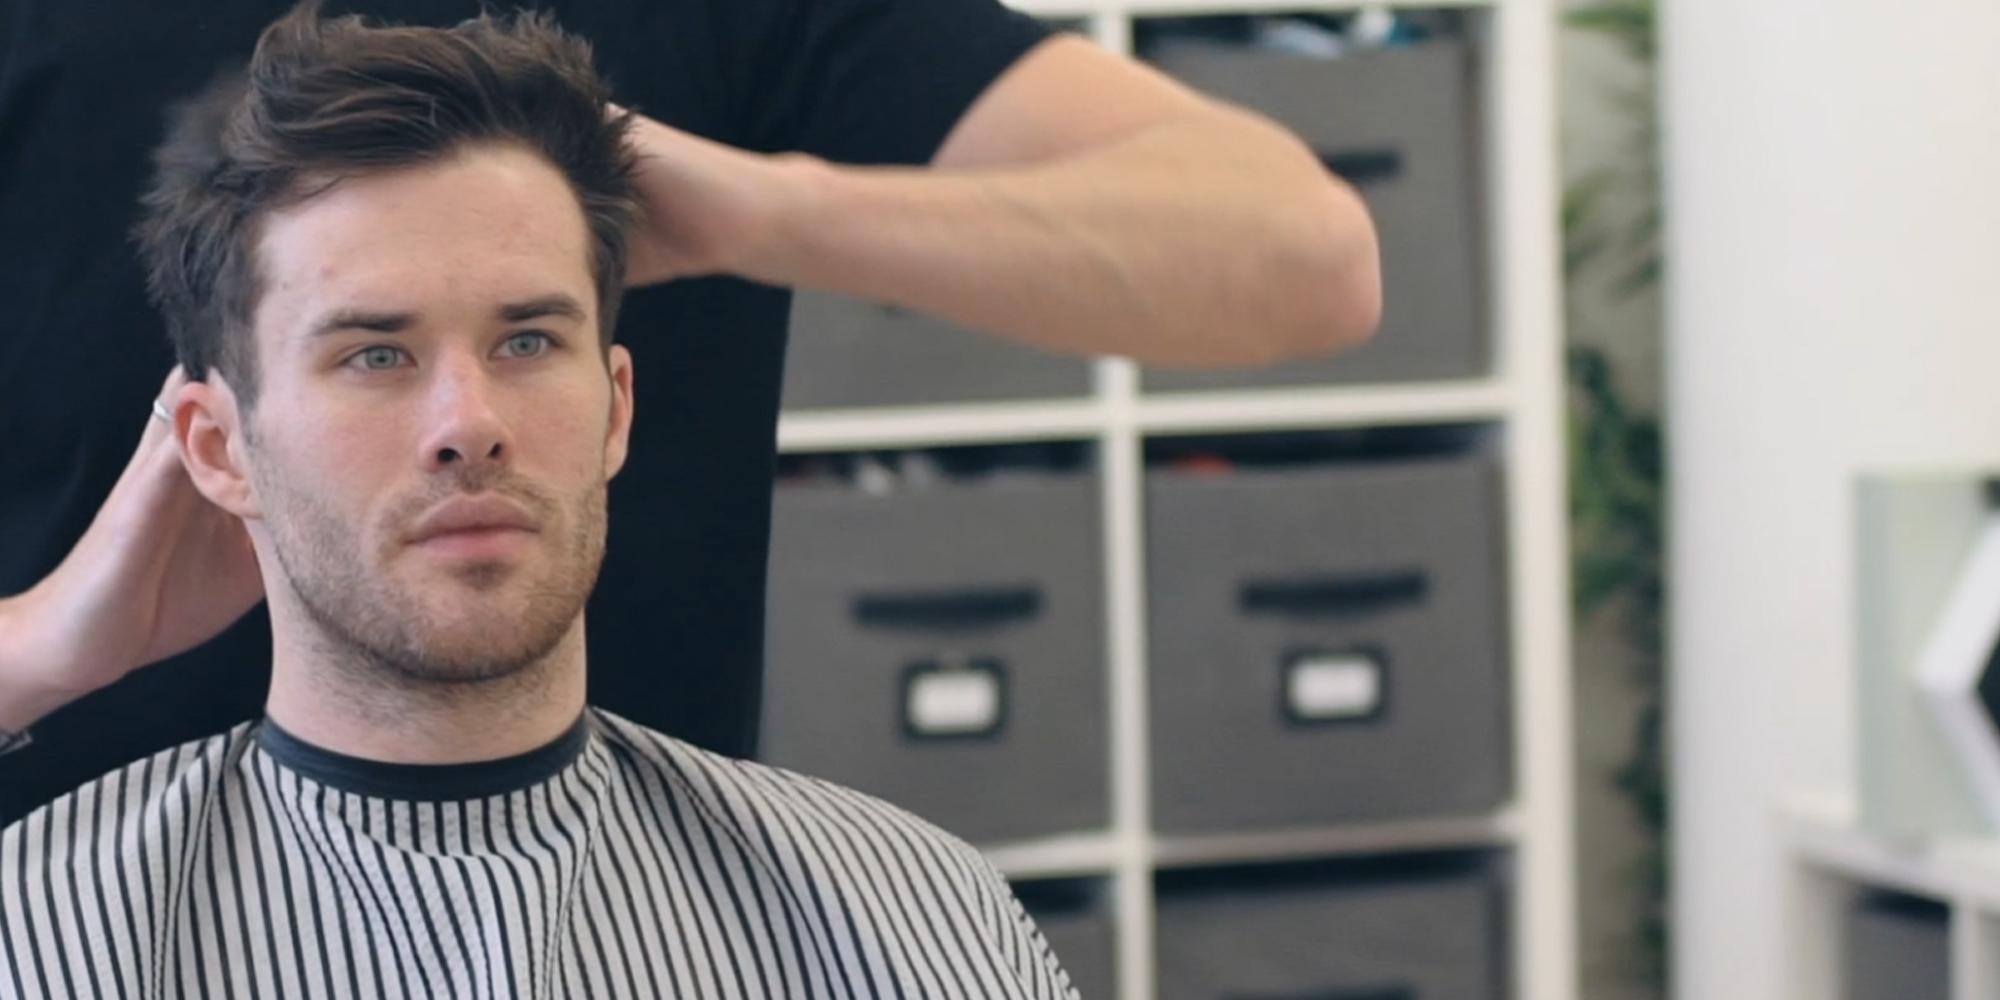 Hanz de Fuko Claymation- Premium Mens Hair Styling Clay with Matte Finish (2 oz) Cruelty Free 7